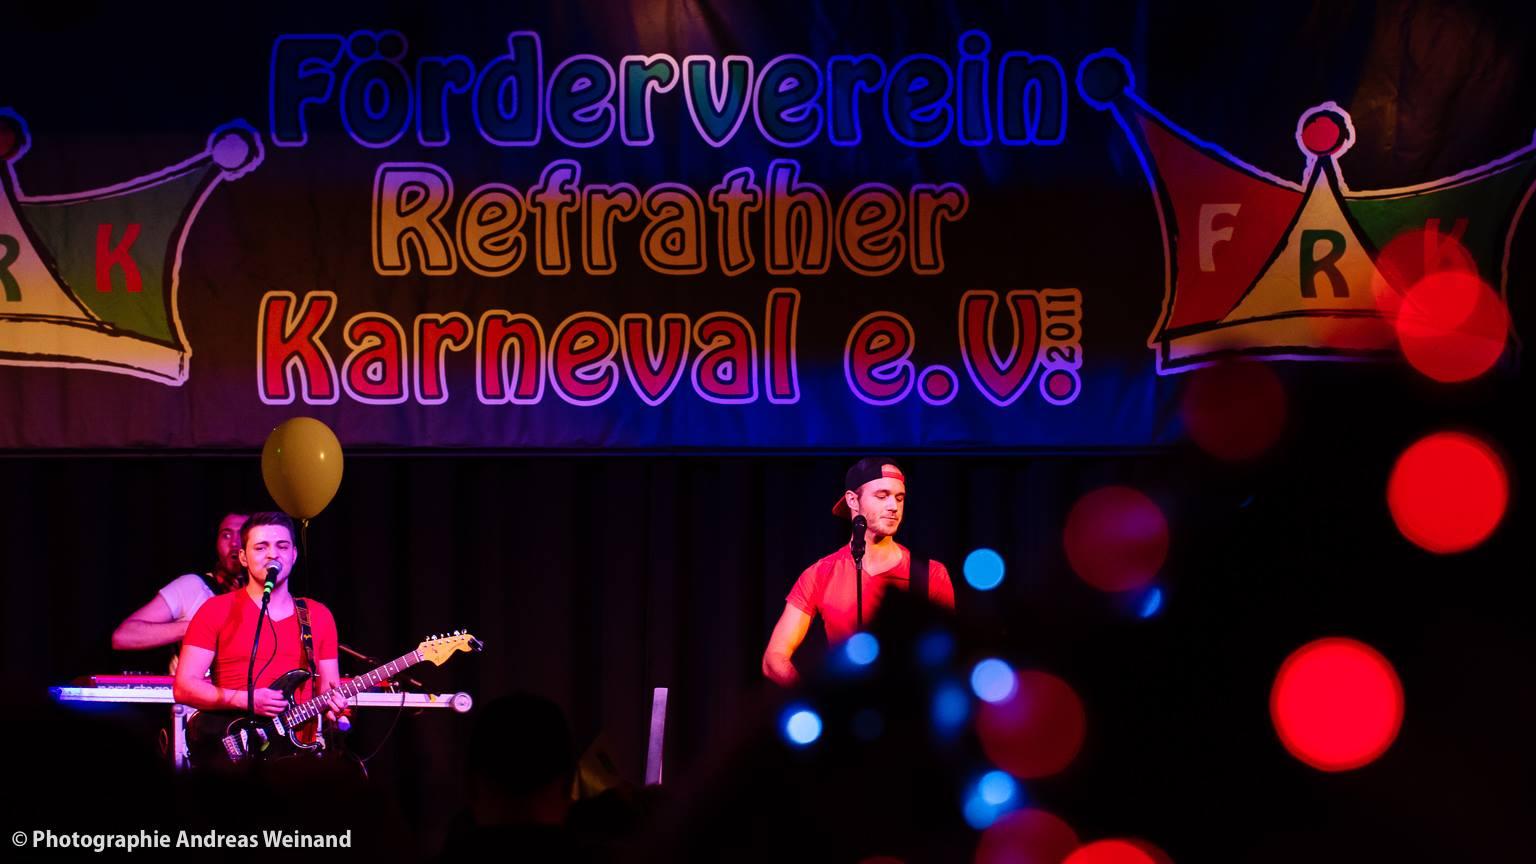 Karnevalsfotografie-Eventfotograf-Karnevalsfotos-Eventfotografie-Veranstaltungsfotograf